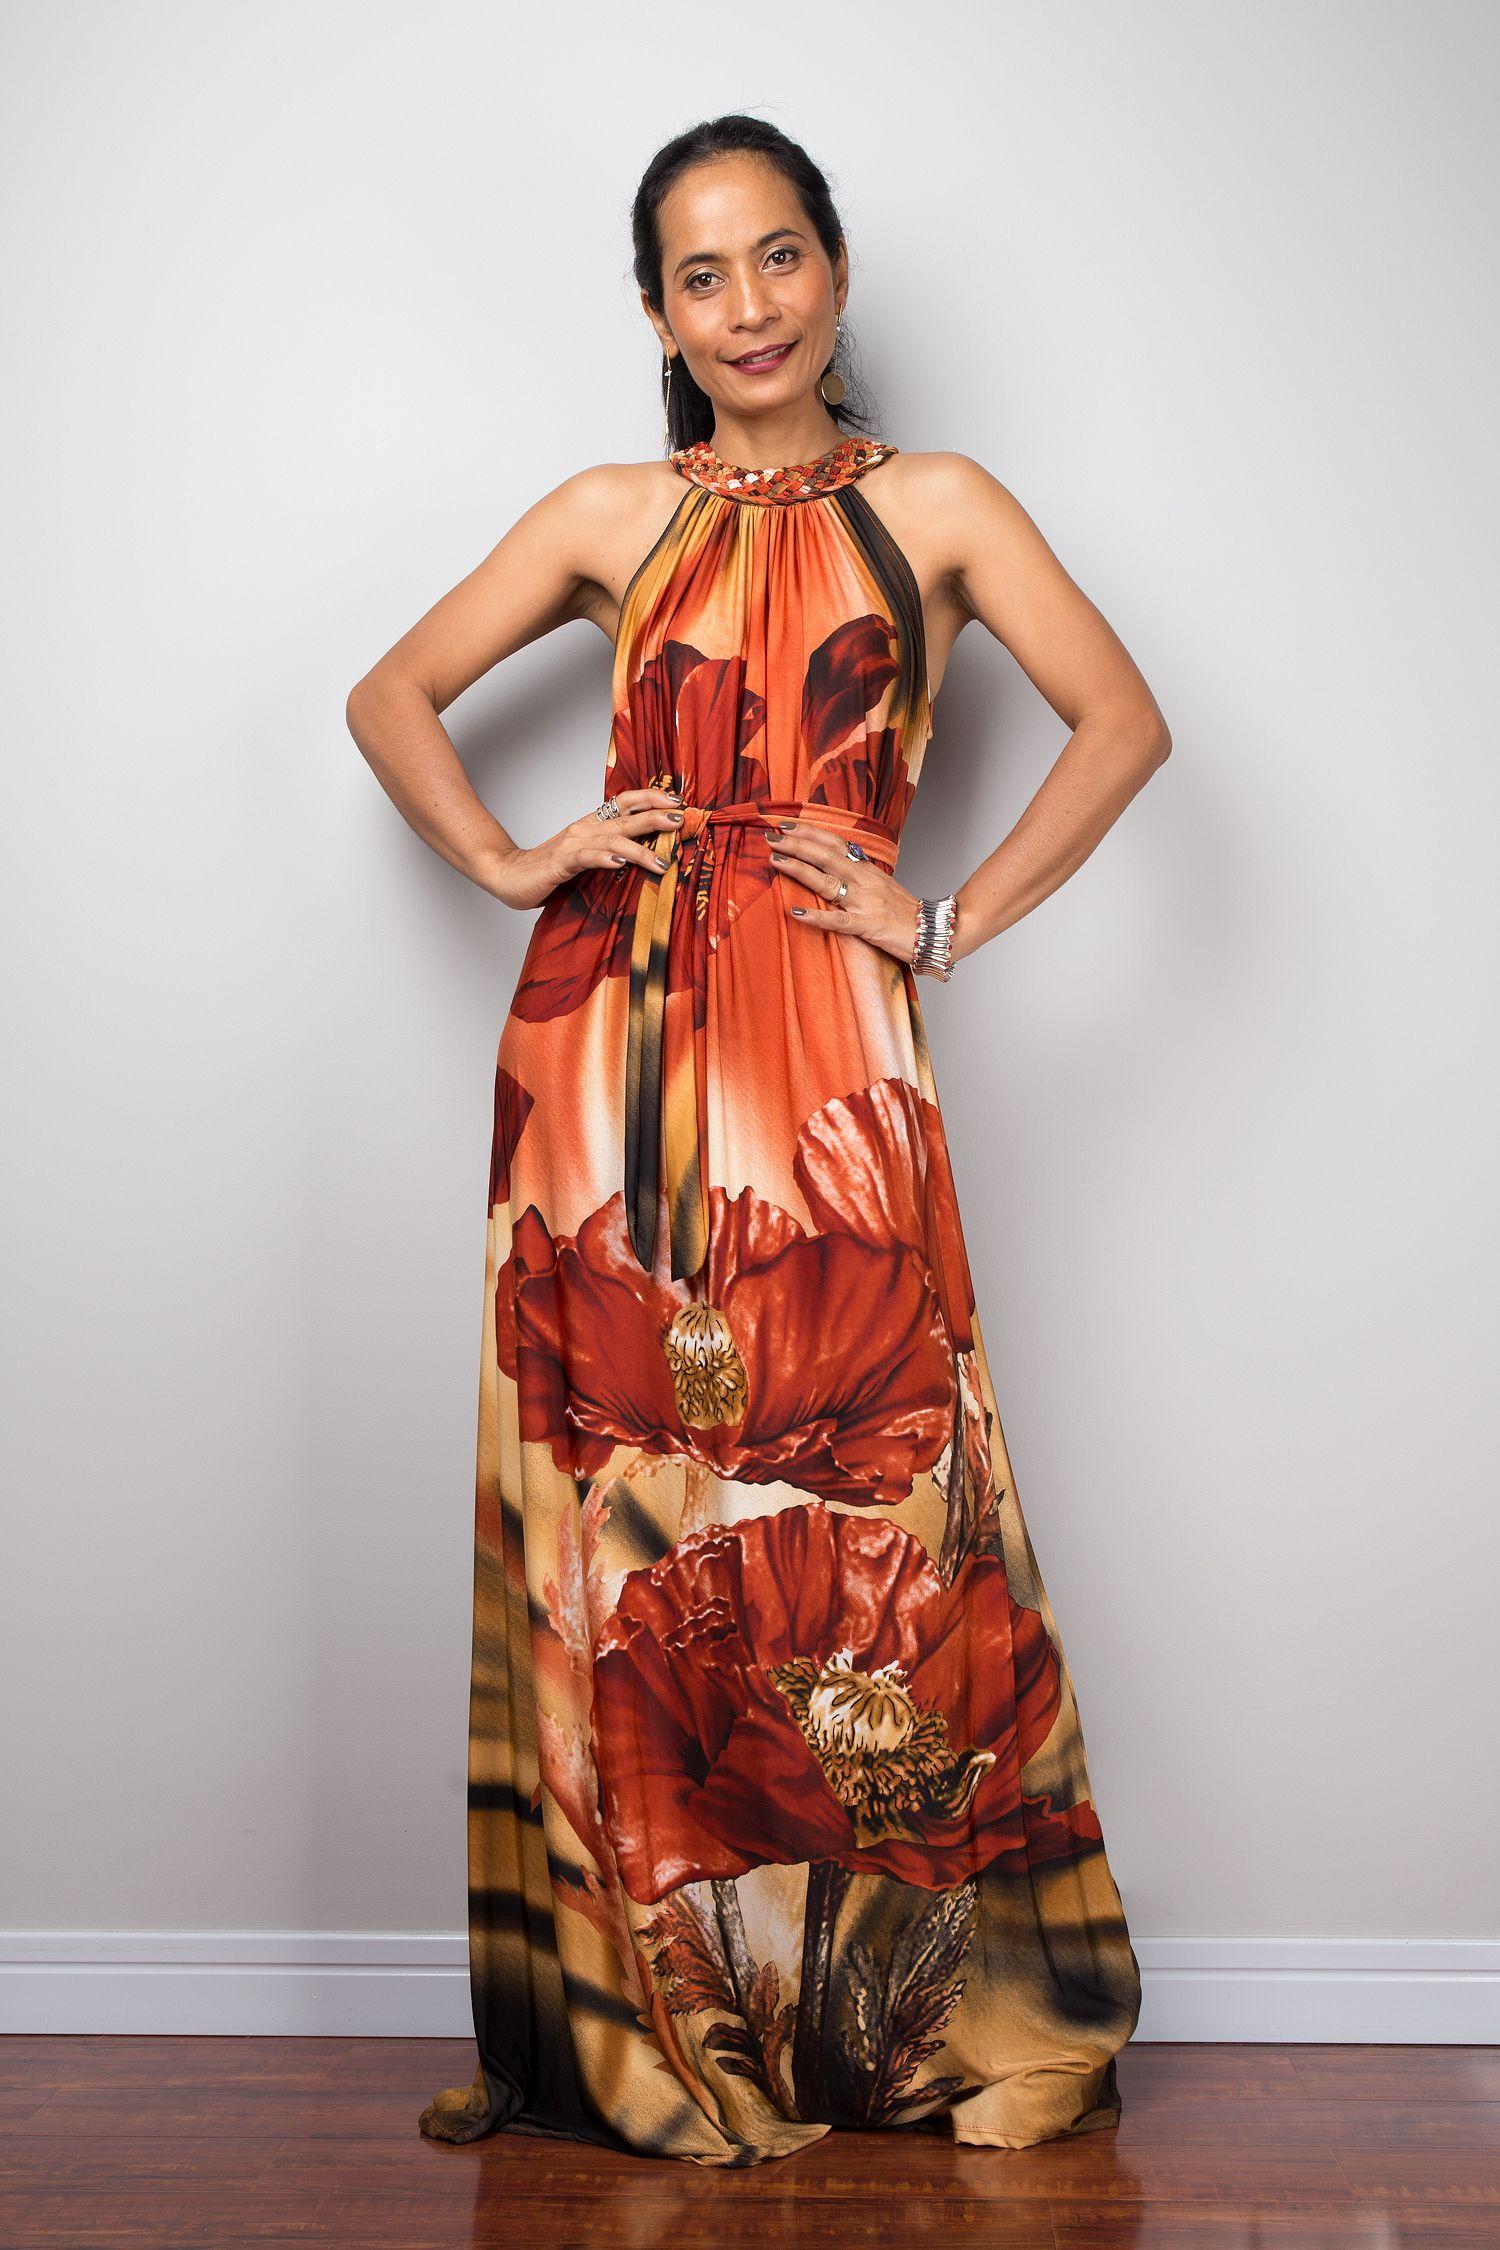 e0f82d5930e8c Boho Halter Floral Maxi Dress   Long tube cocktail dress in 2019 ...